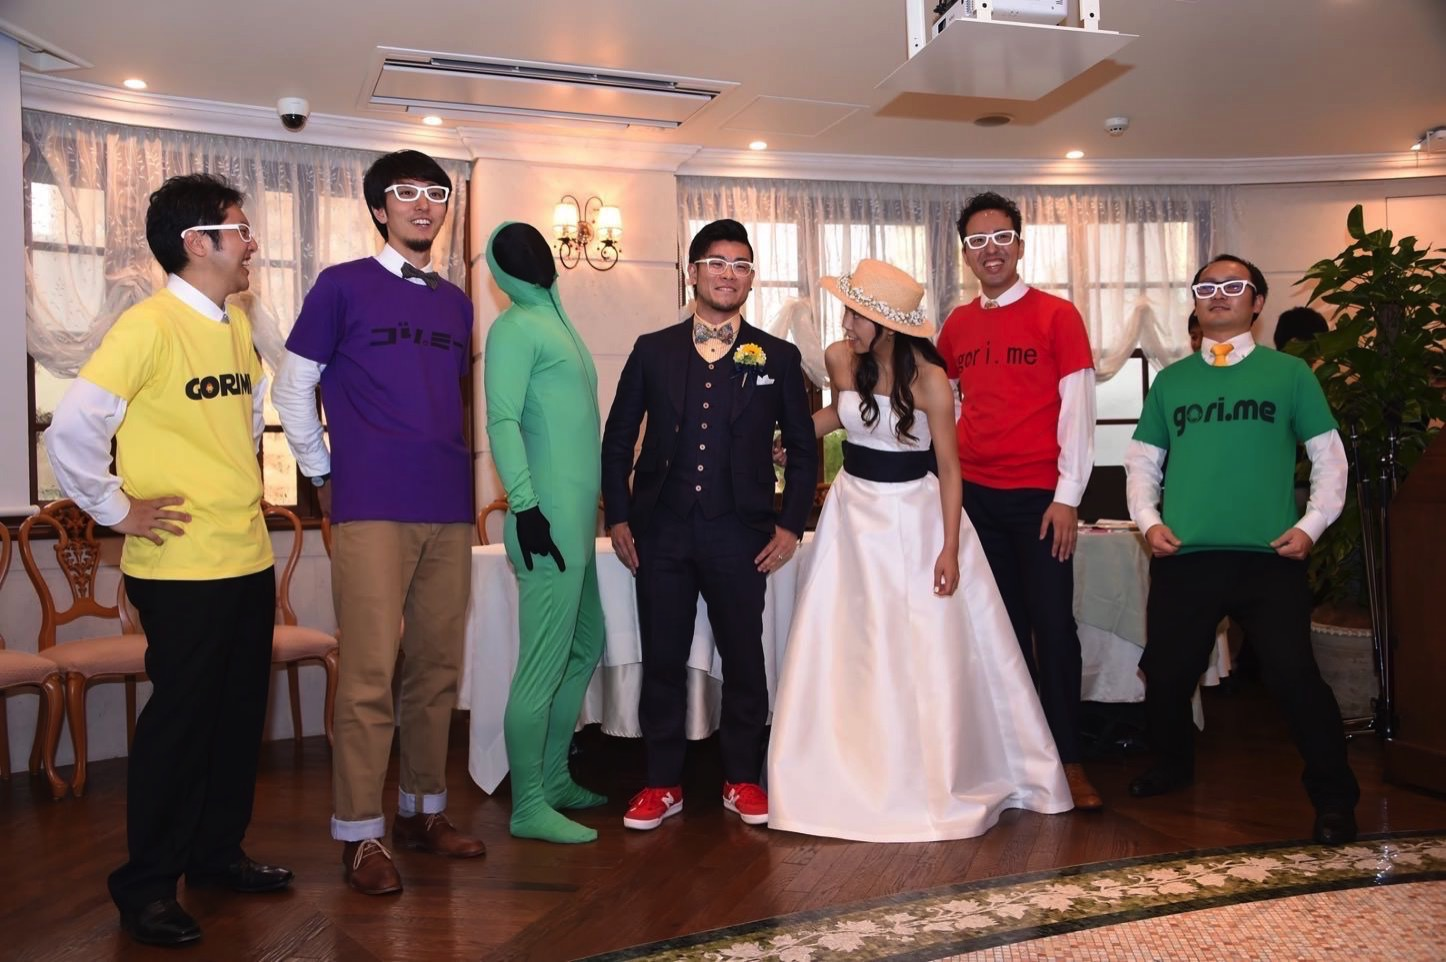 GoriMe-Wedding-Ting-Tong-Dessert-05.JPG